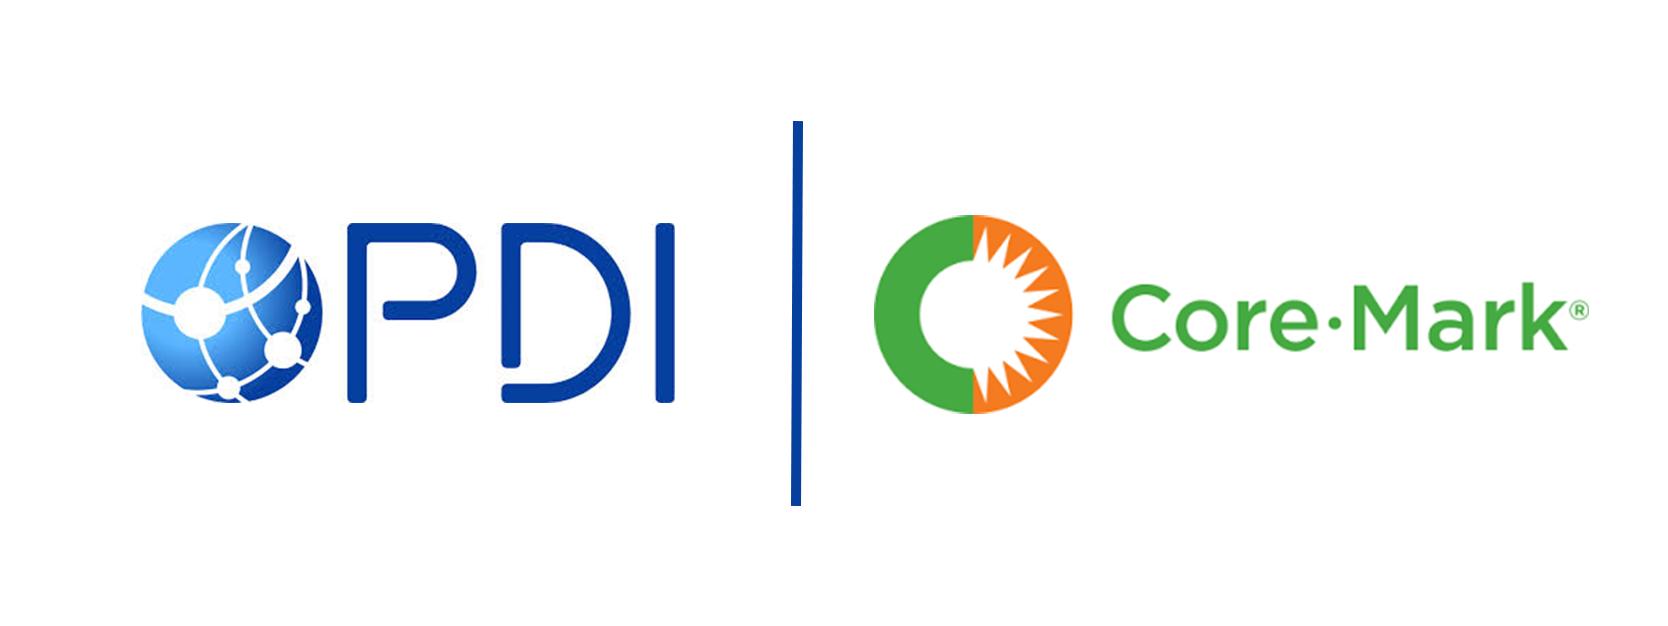 Core mark Partnership Logos